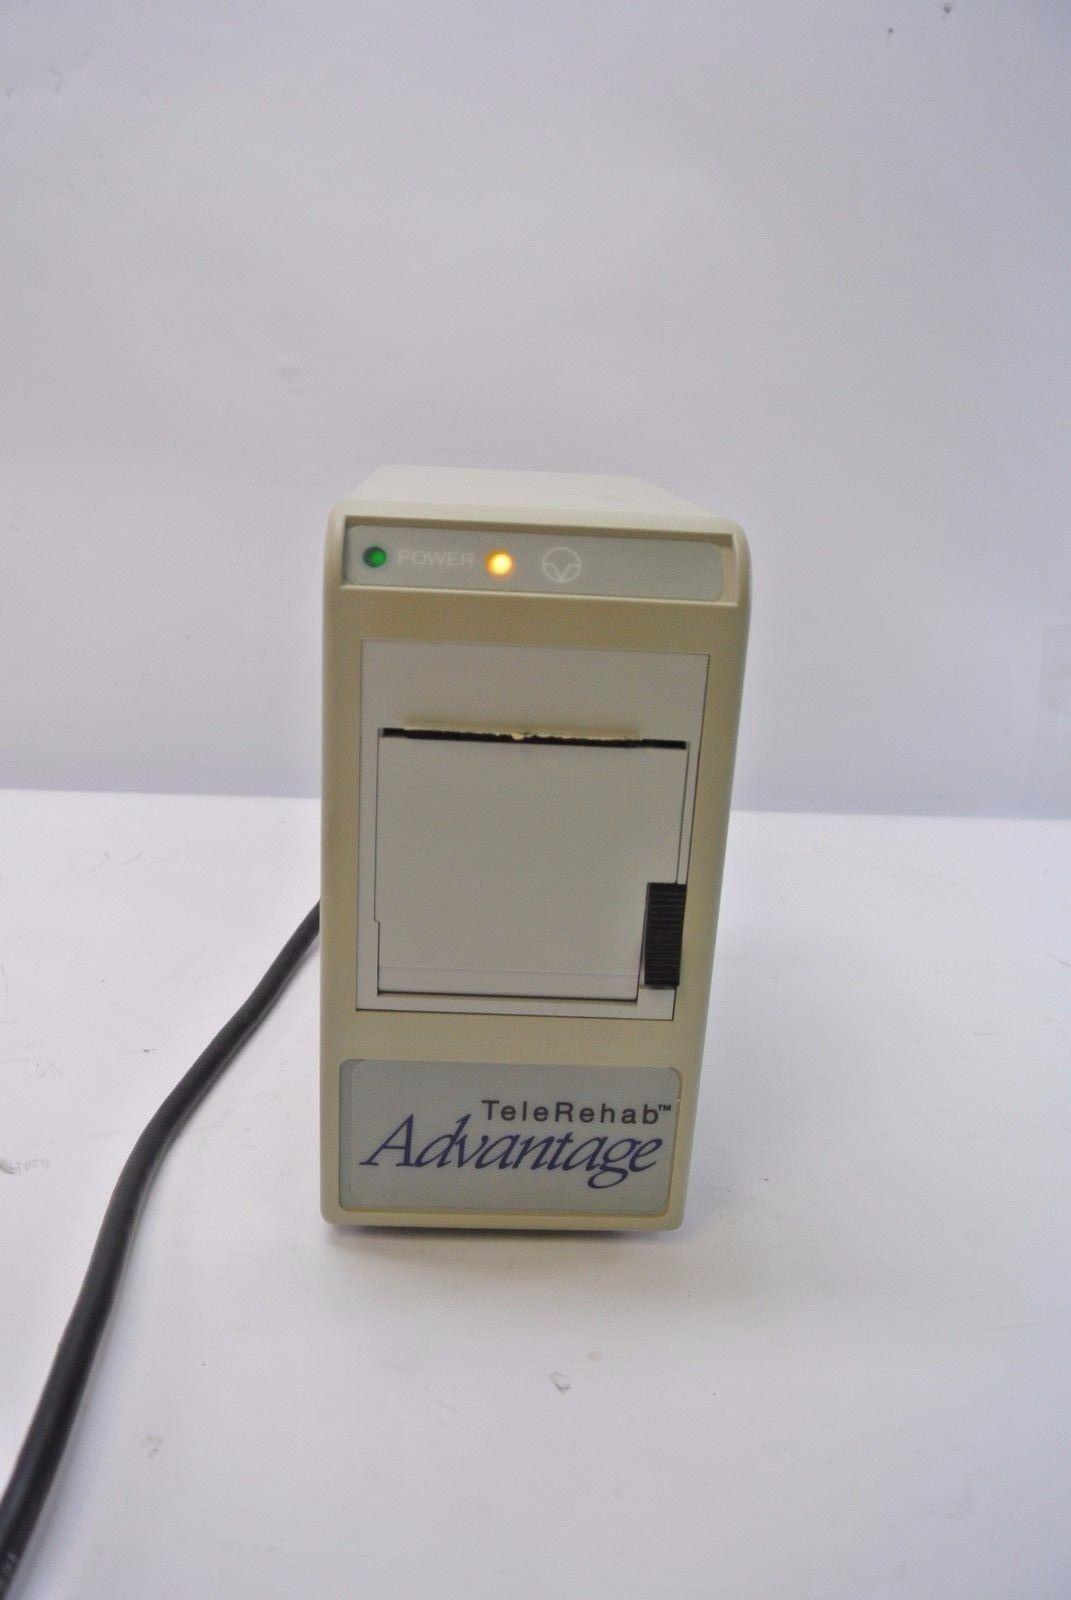 Advantage TeleRehab Printer GSI Group XE-50P